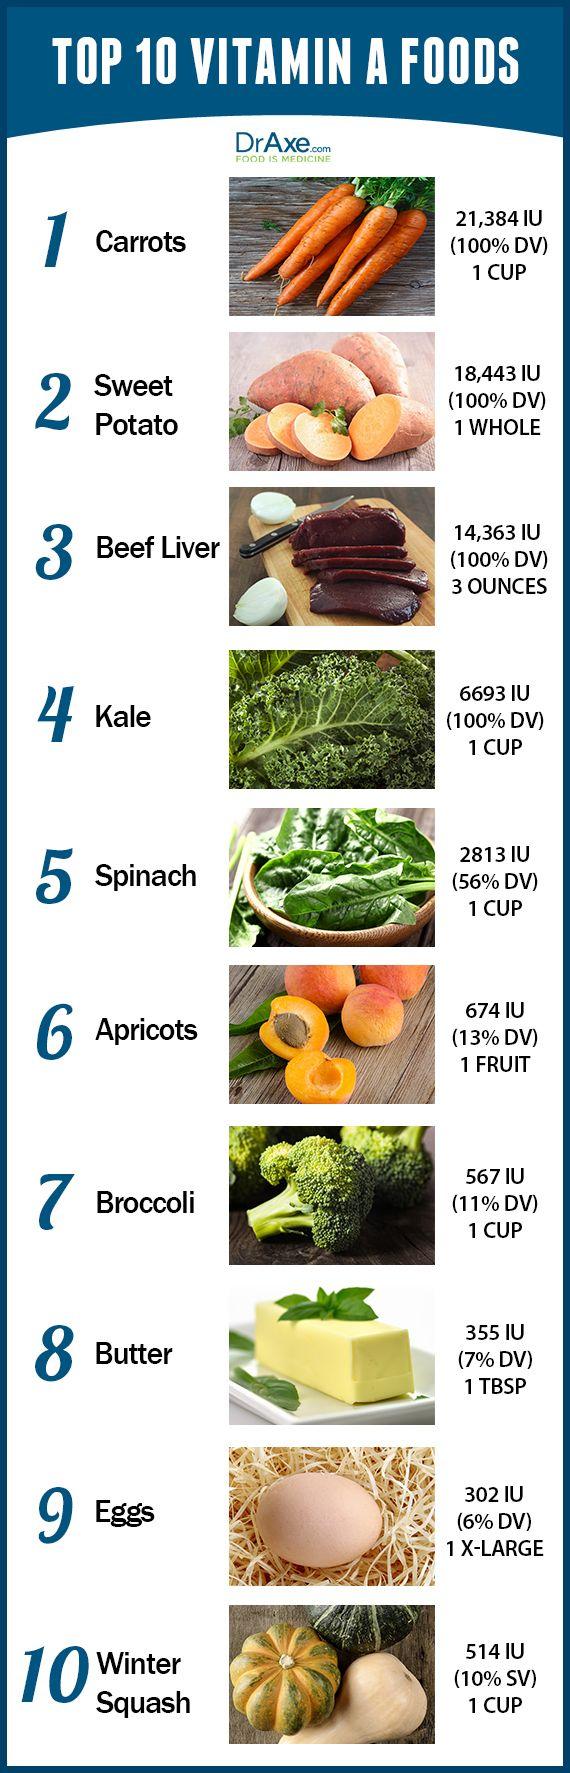 Top 10 Vitamin A Foods List